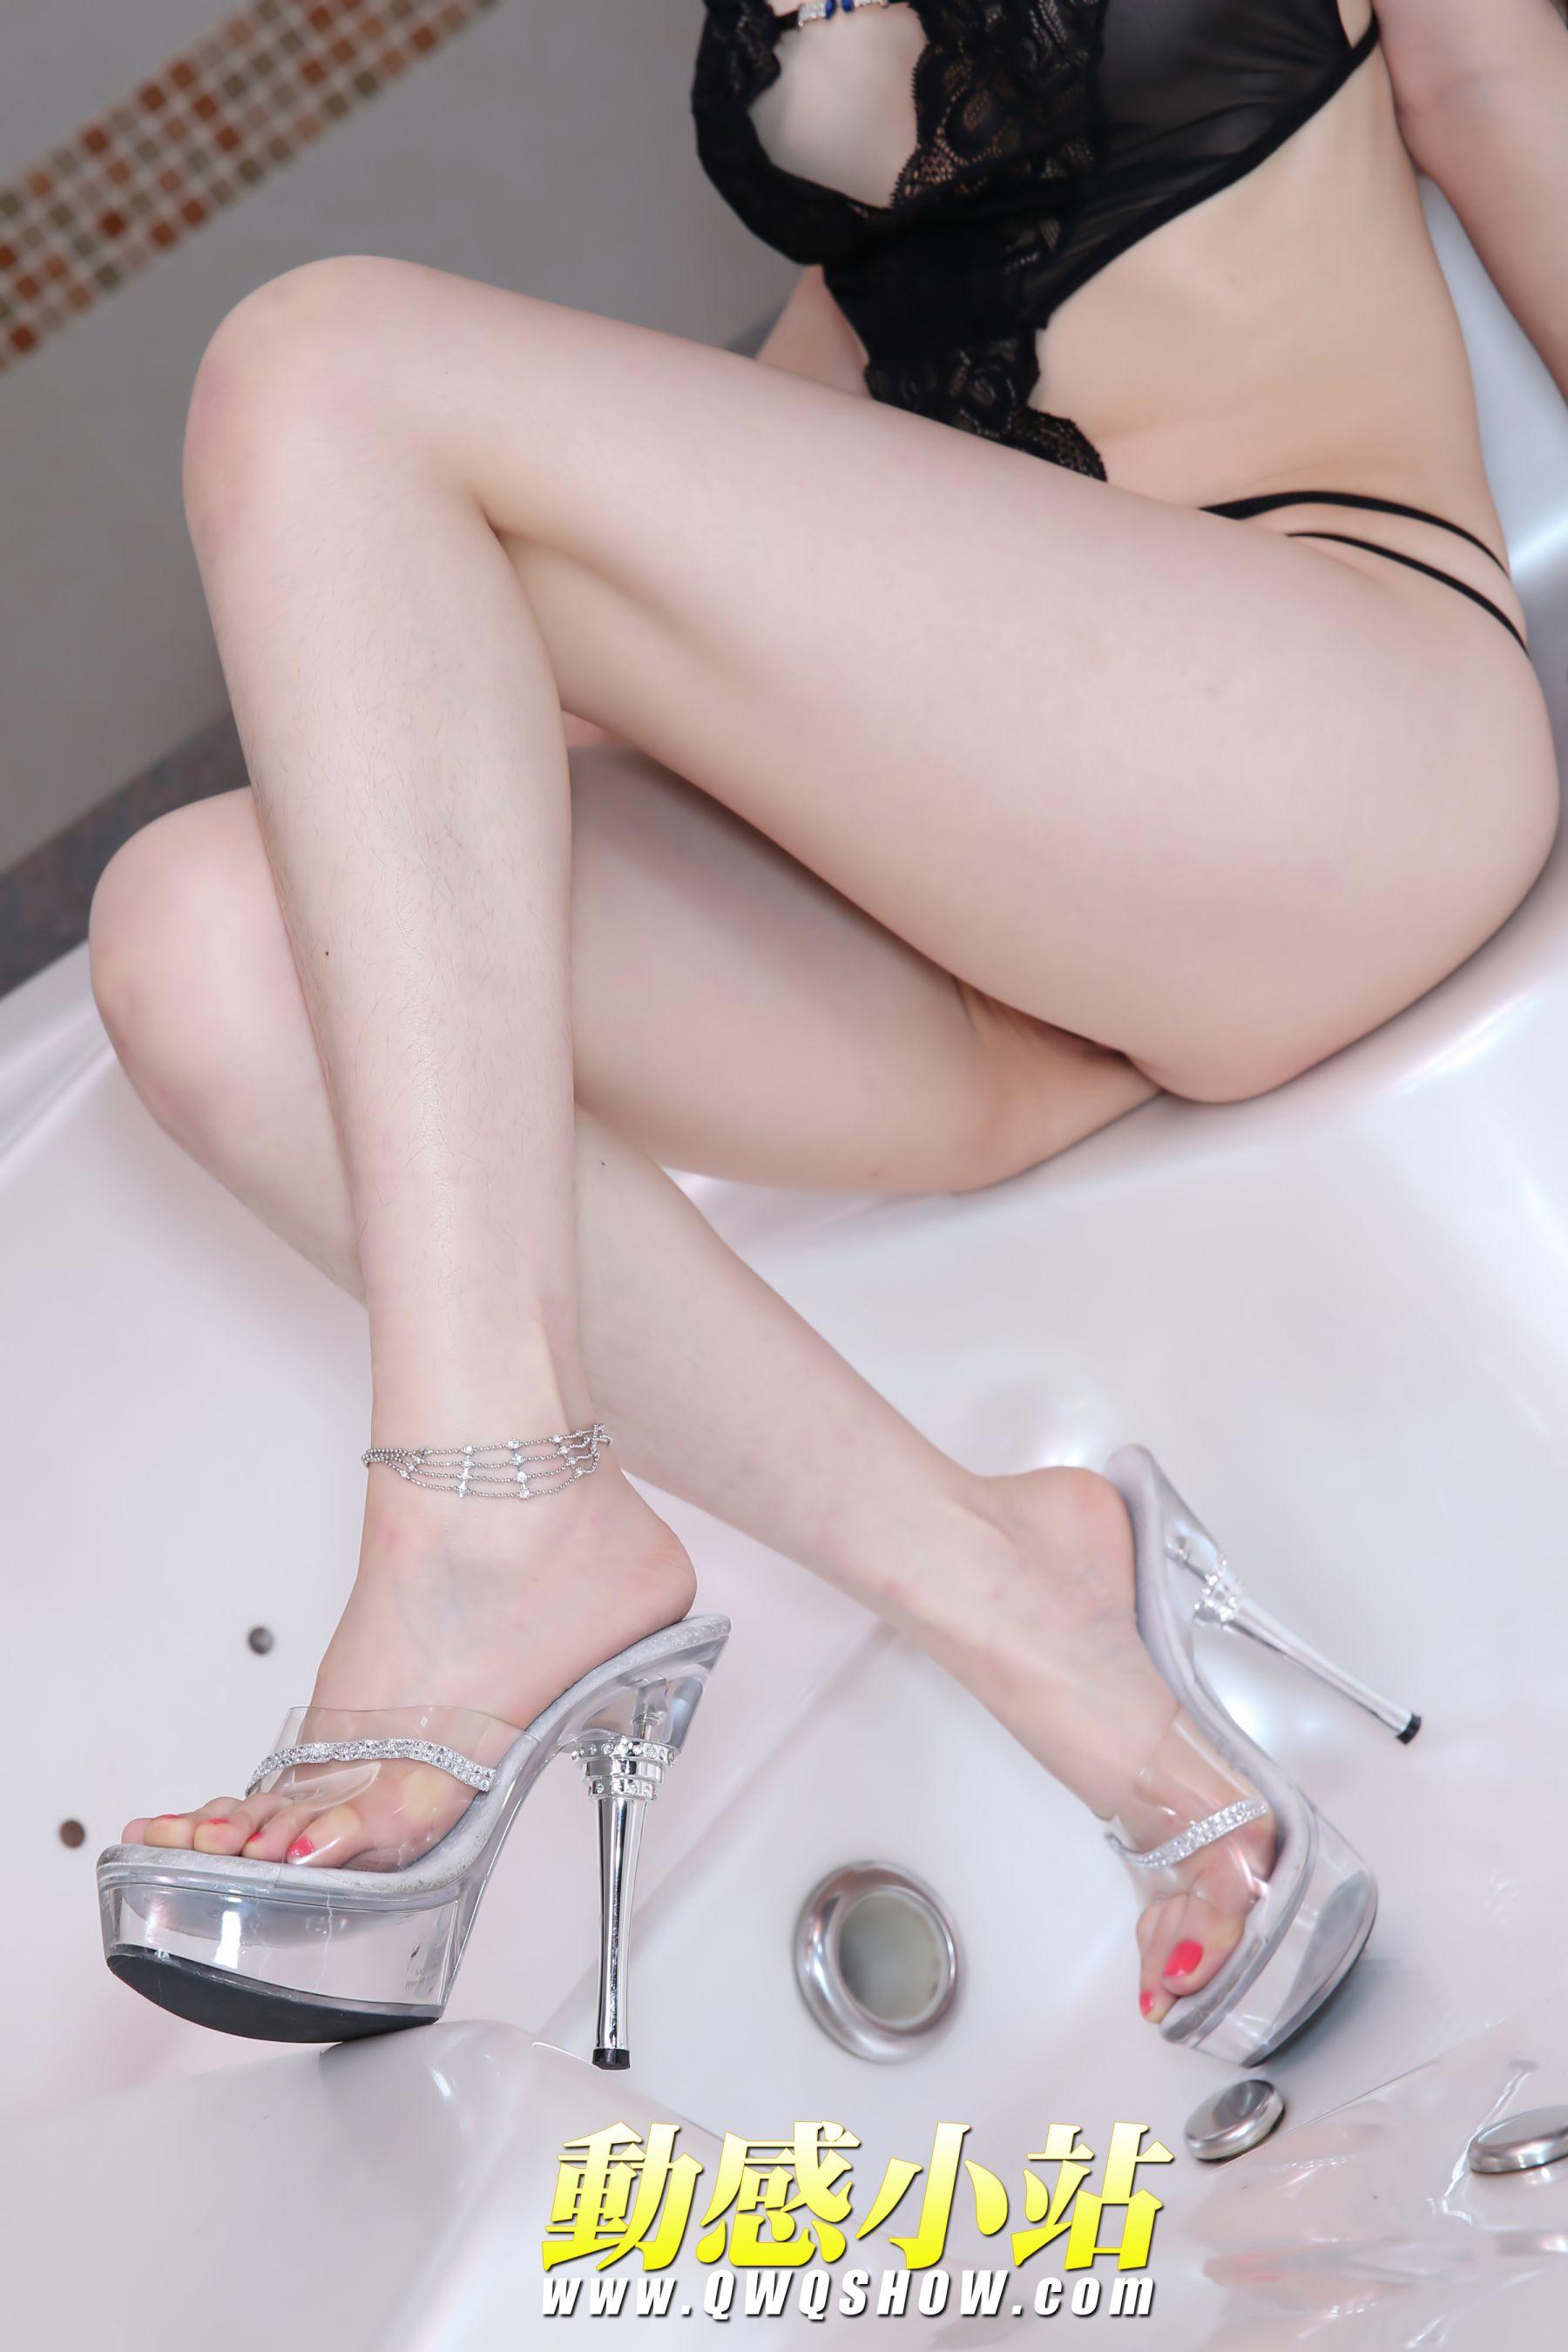 VOL.419 [动感之星]浴室熟女:小玲(动感小站小玲,动感之星小玲)高品质写真套图(14P)